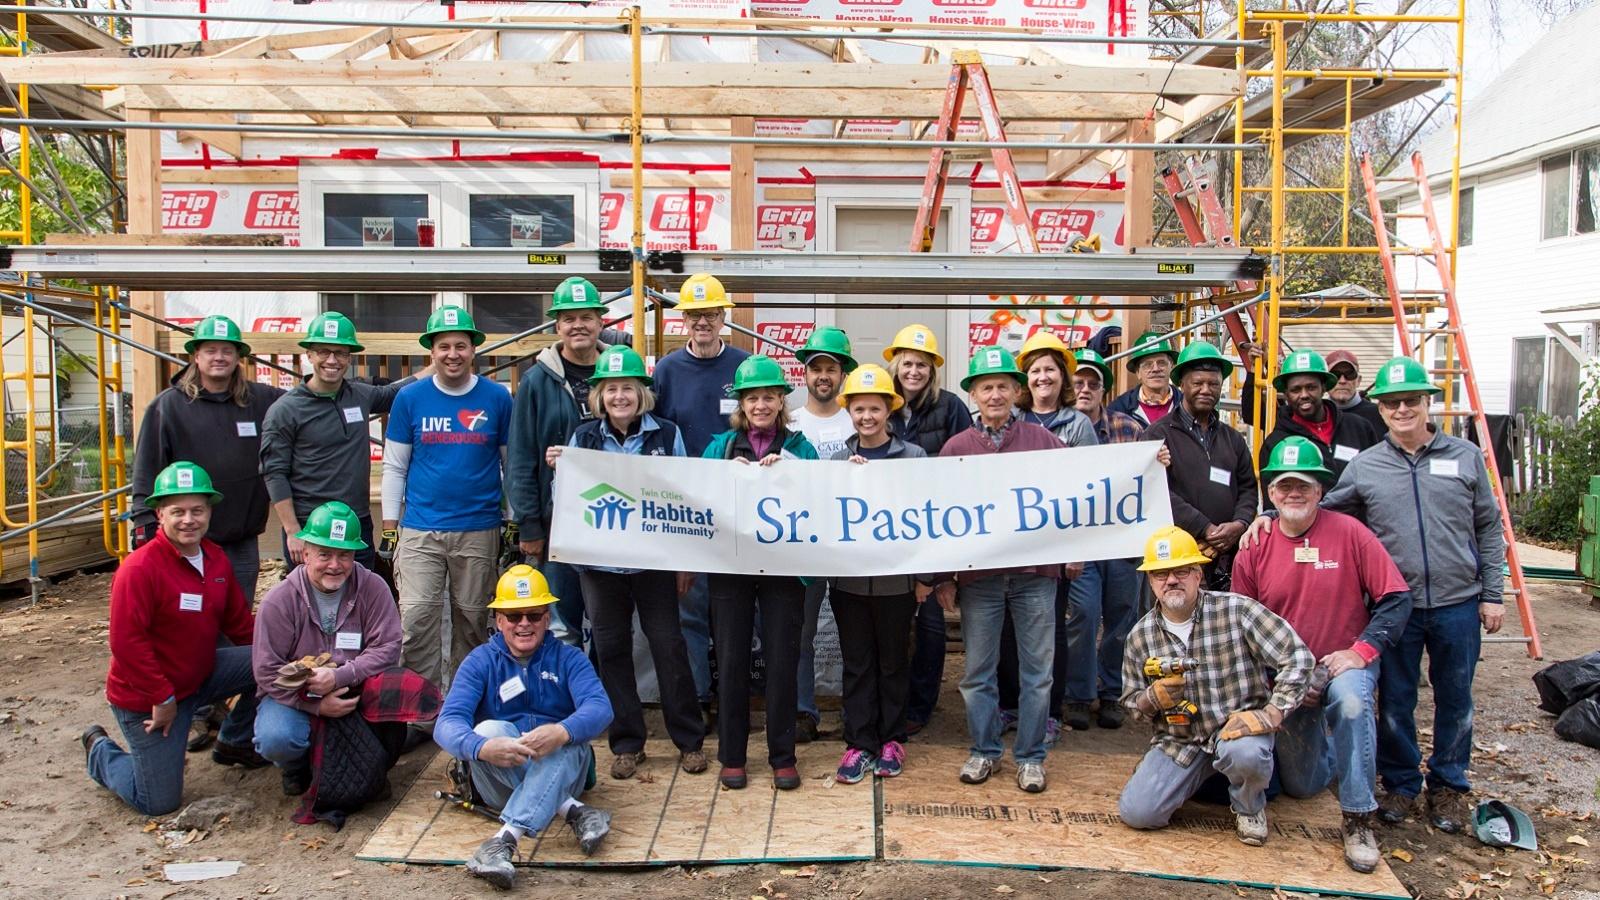 Senior Pastor Build Group Photo.jpg